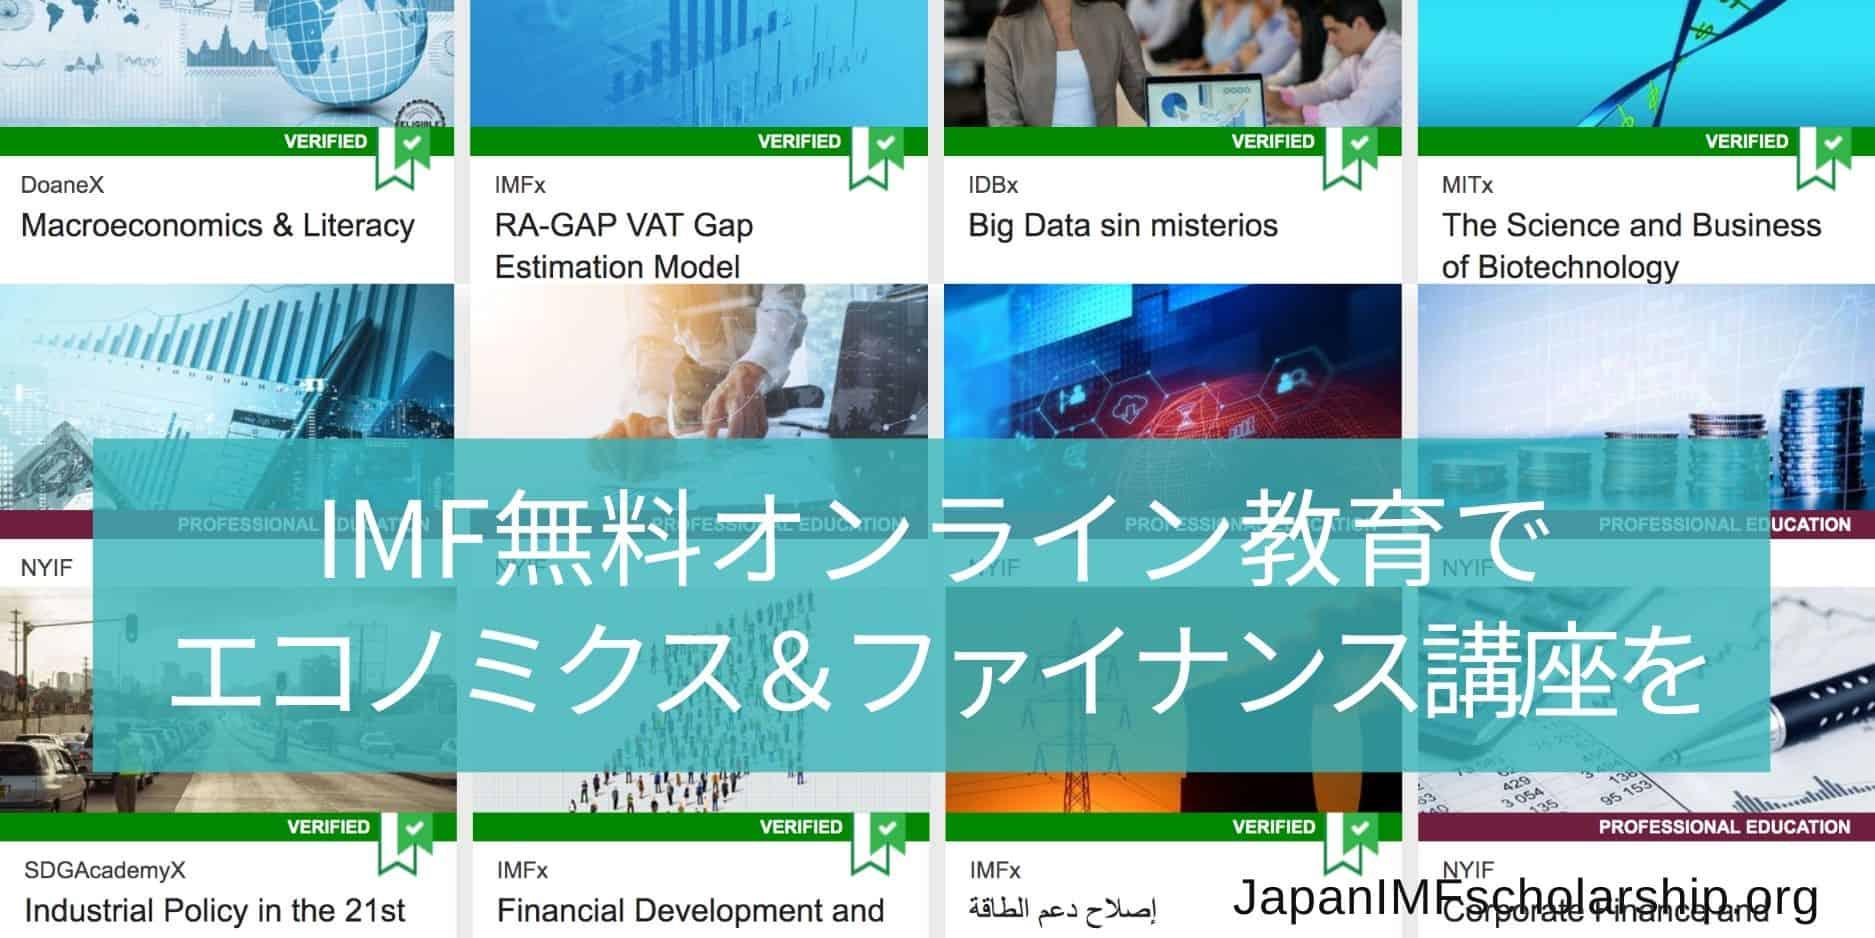 jisp web-fb imf edx free online education by self-paced